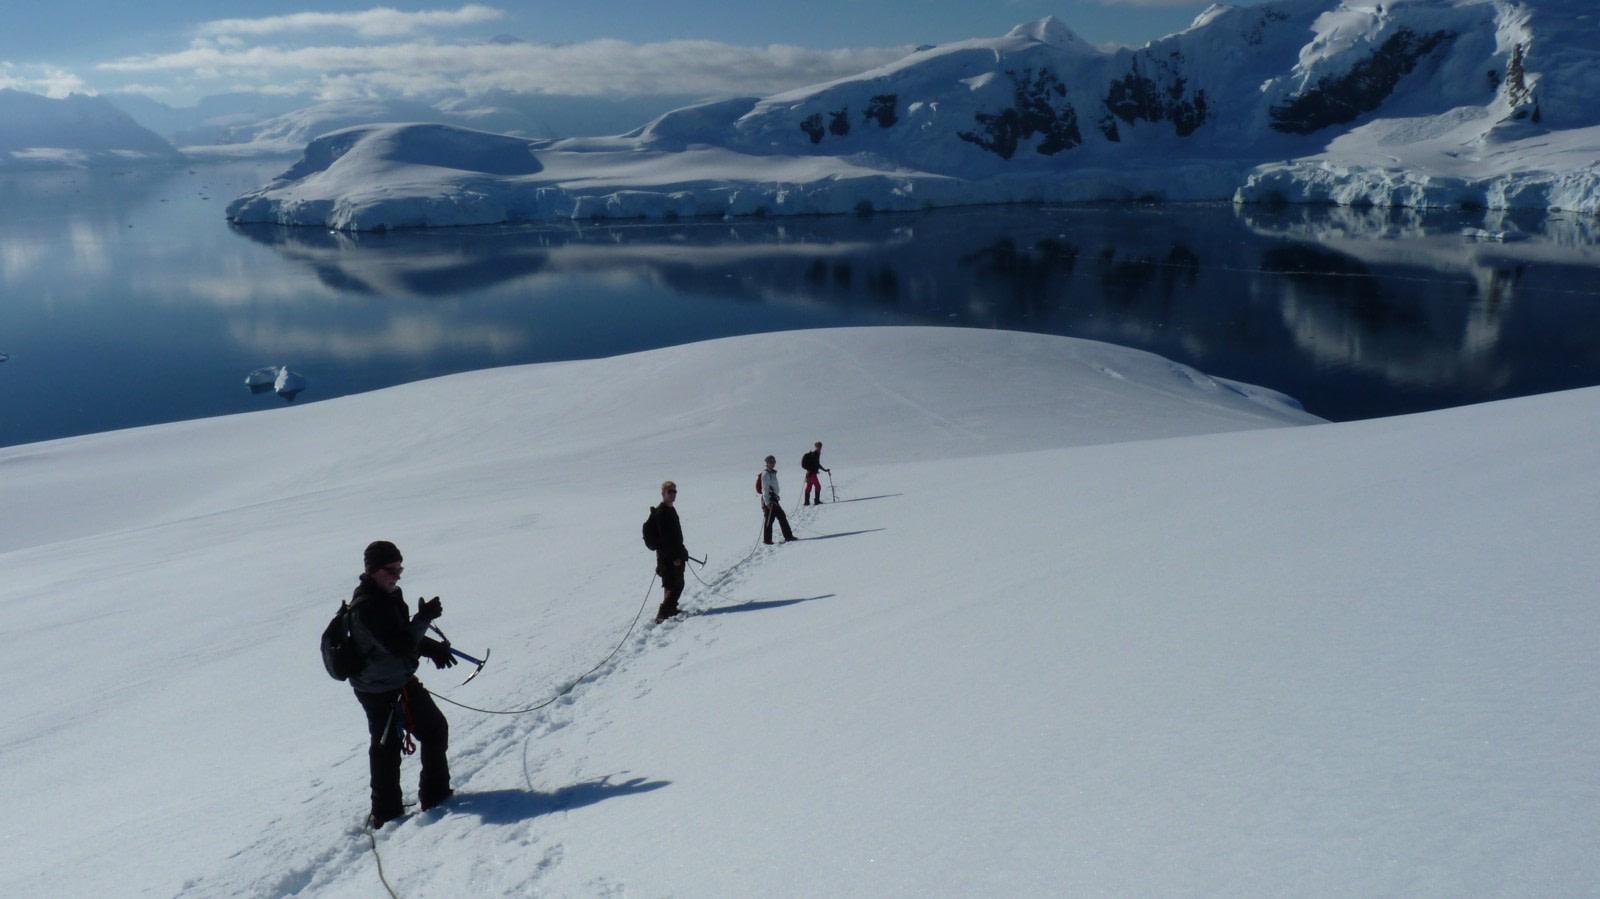 Mountaineering_Basecamp Plancius © Oceanwide Expeditions-Christoph Gniesser 068.JPG